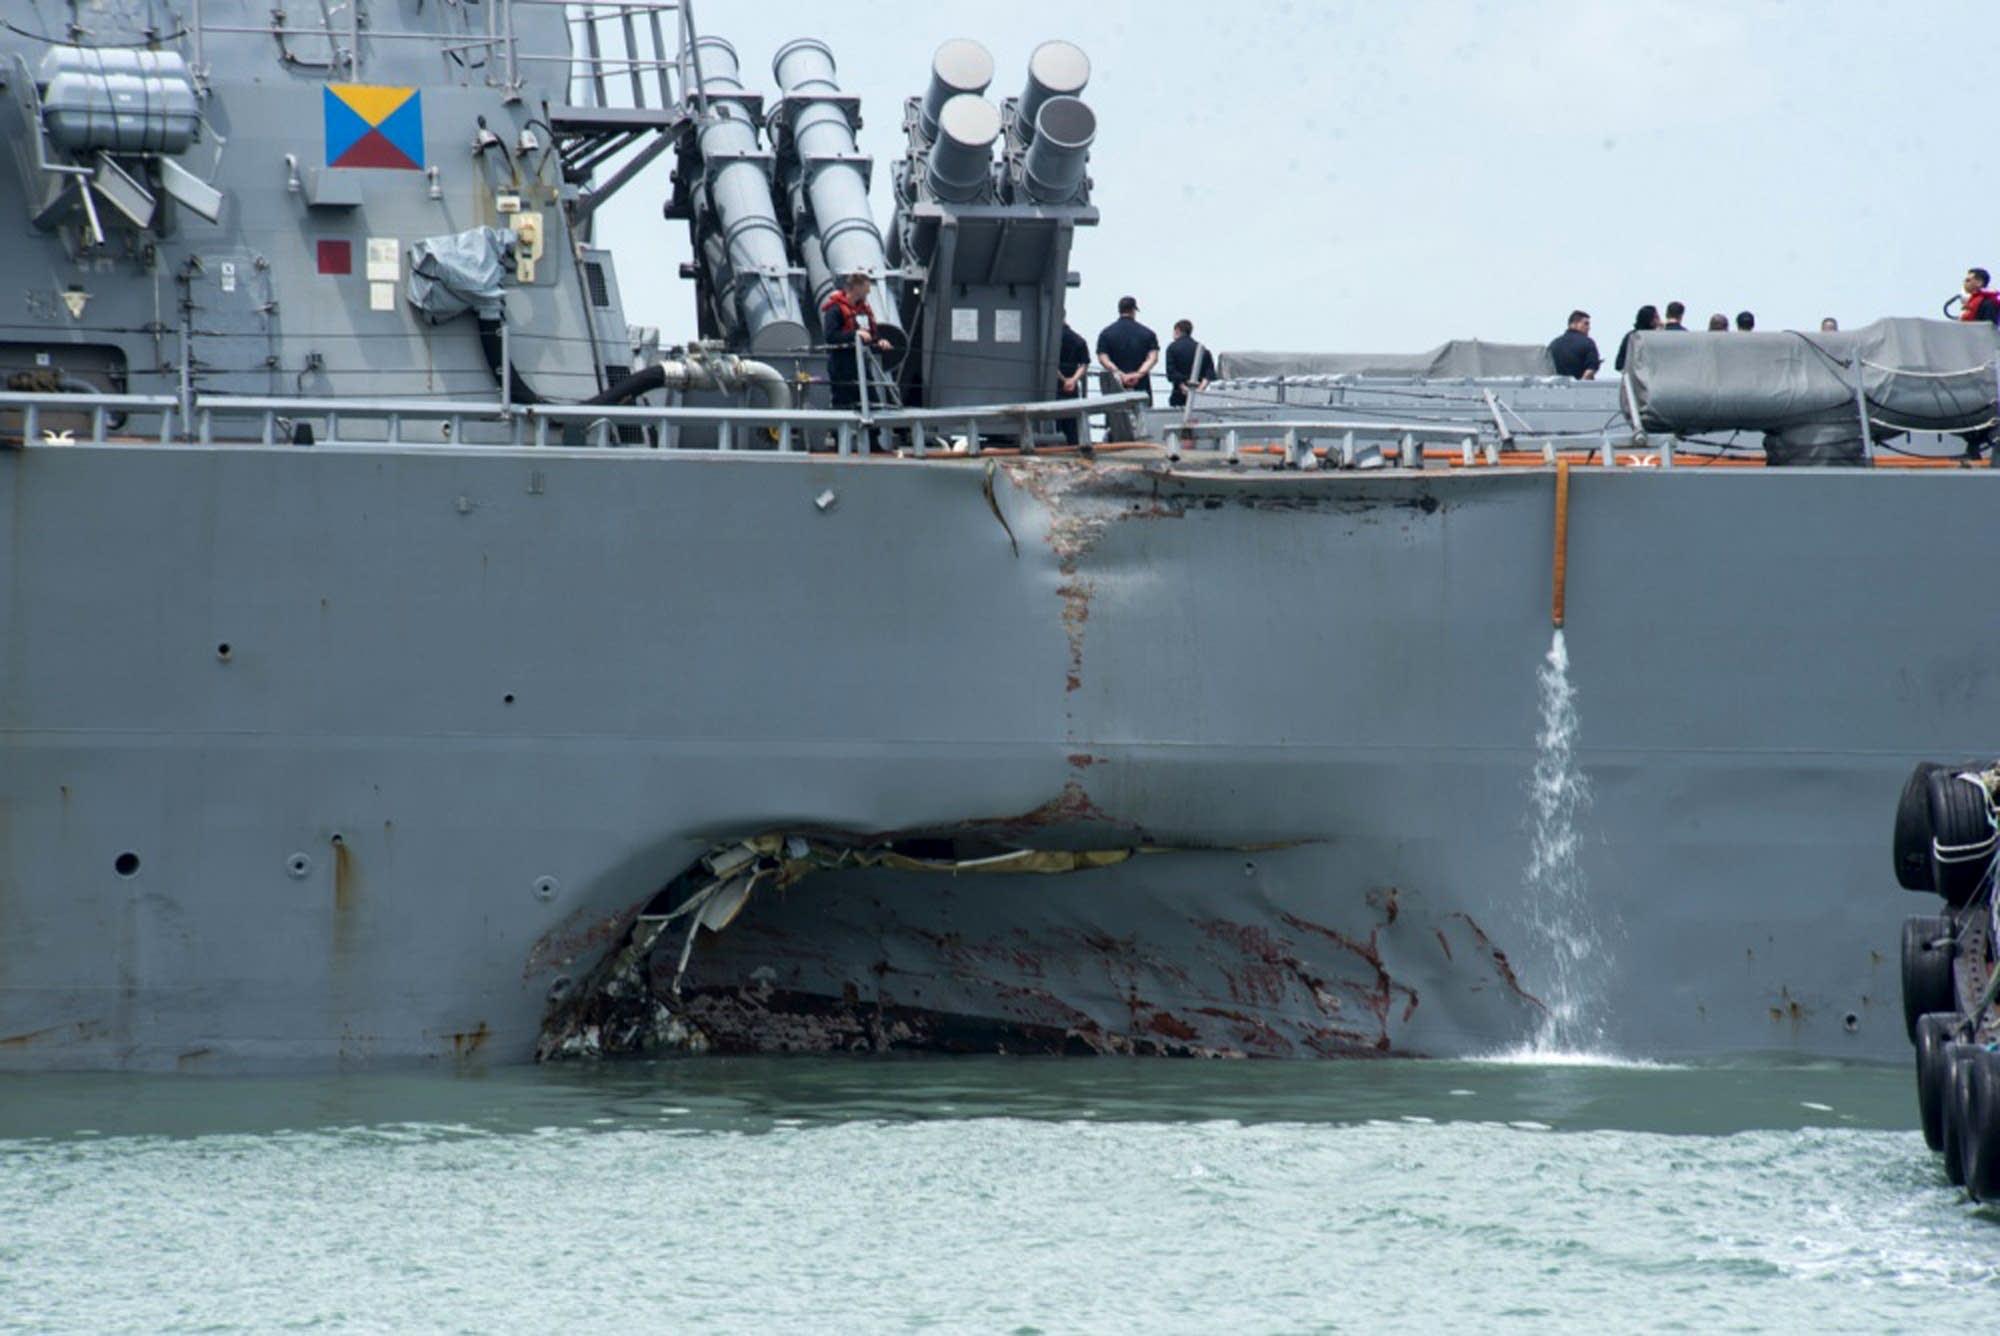 Damage to the portside of the USS John S. McCain.